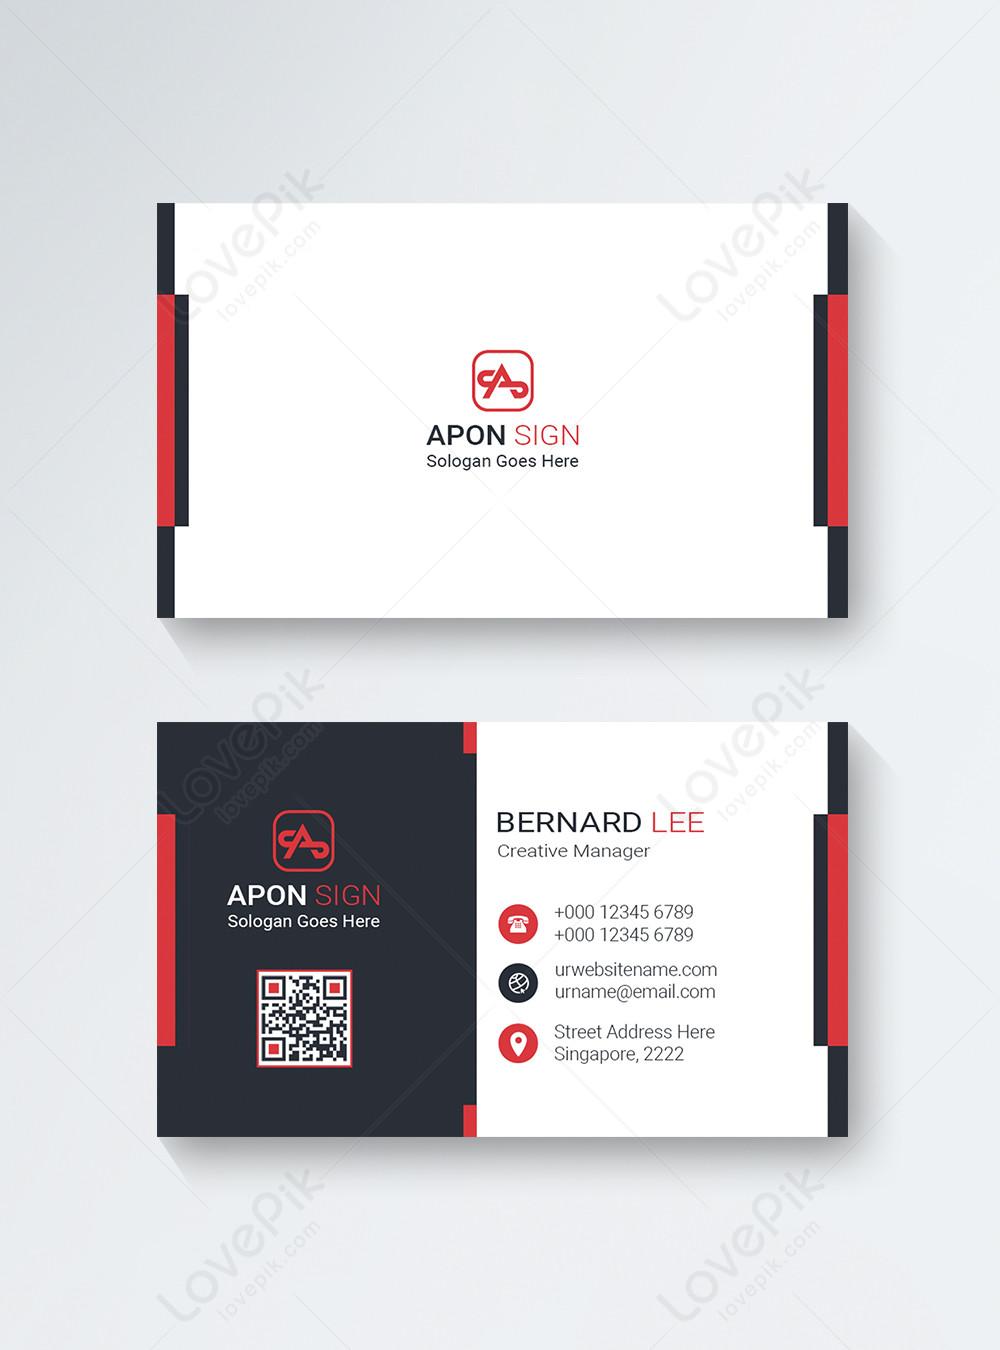 Desain Kartu Nama Perusahaan Gambar Unduh Gratis Templat 450004308 Format Gambar Psd Lovepik Com